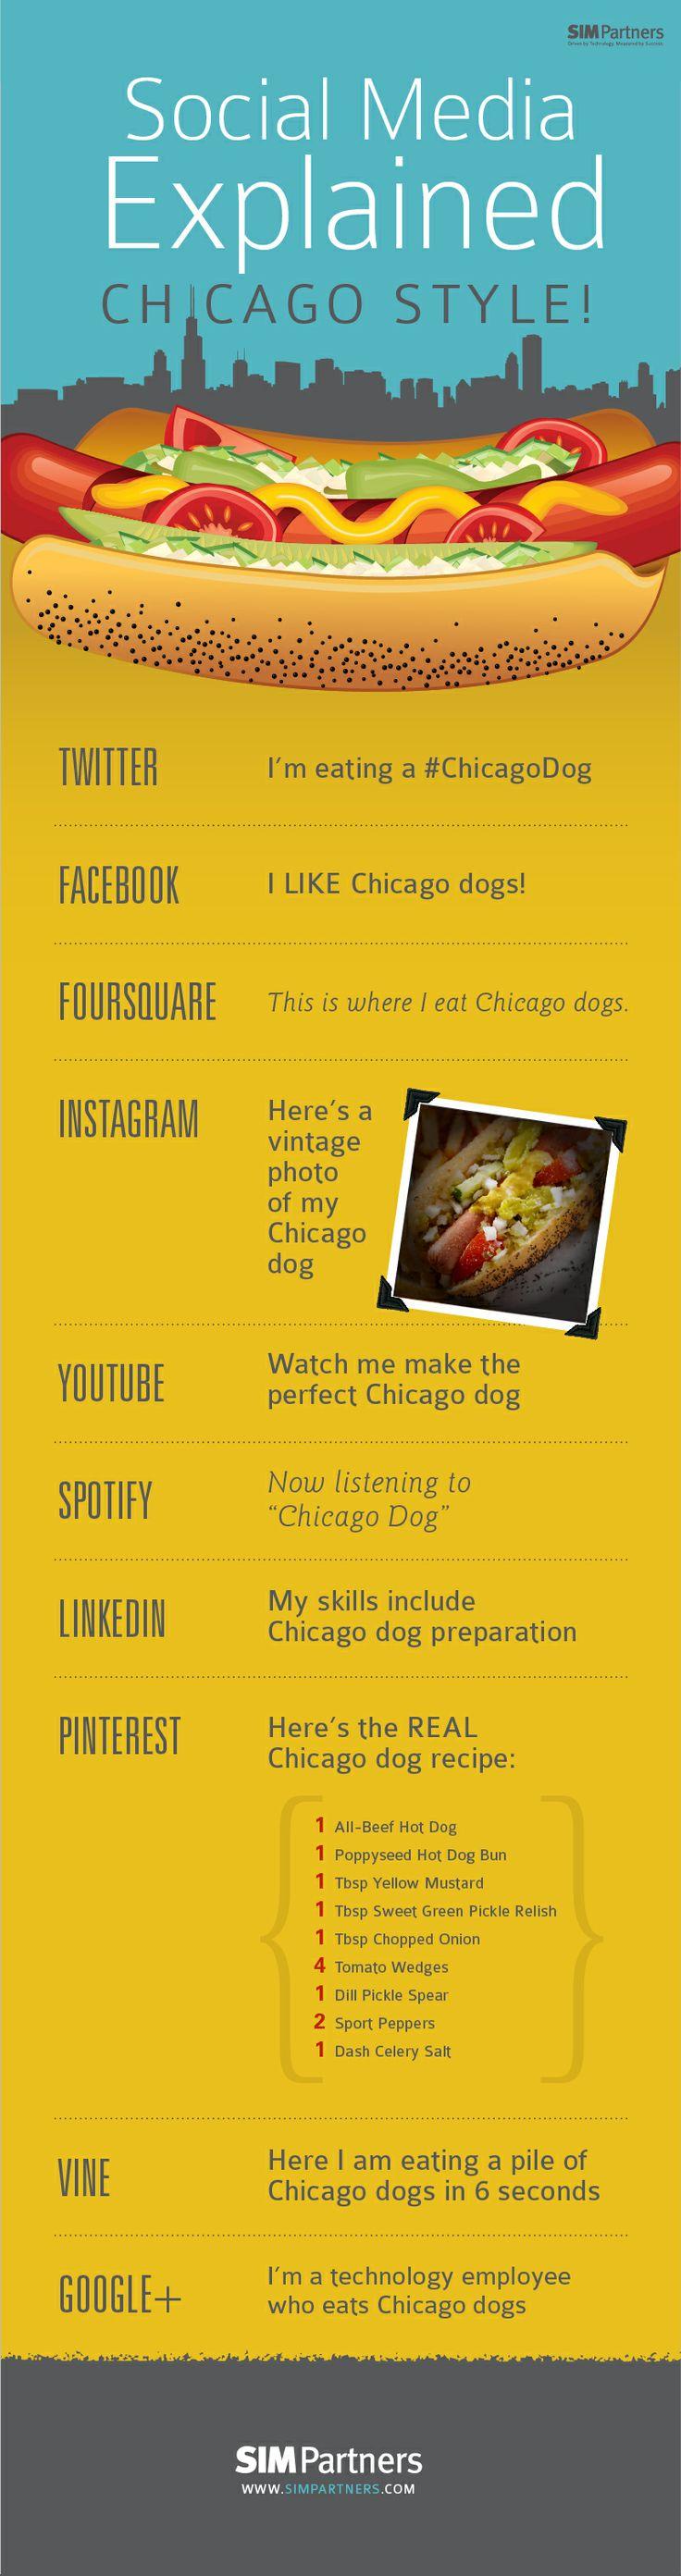 Social Media Explained: Chicago Style - #SocialMedia #Infographic